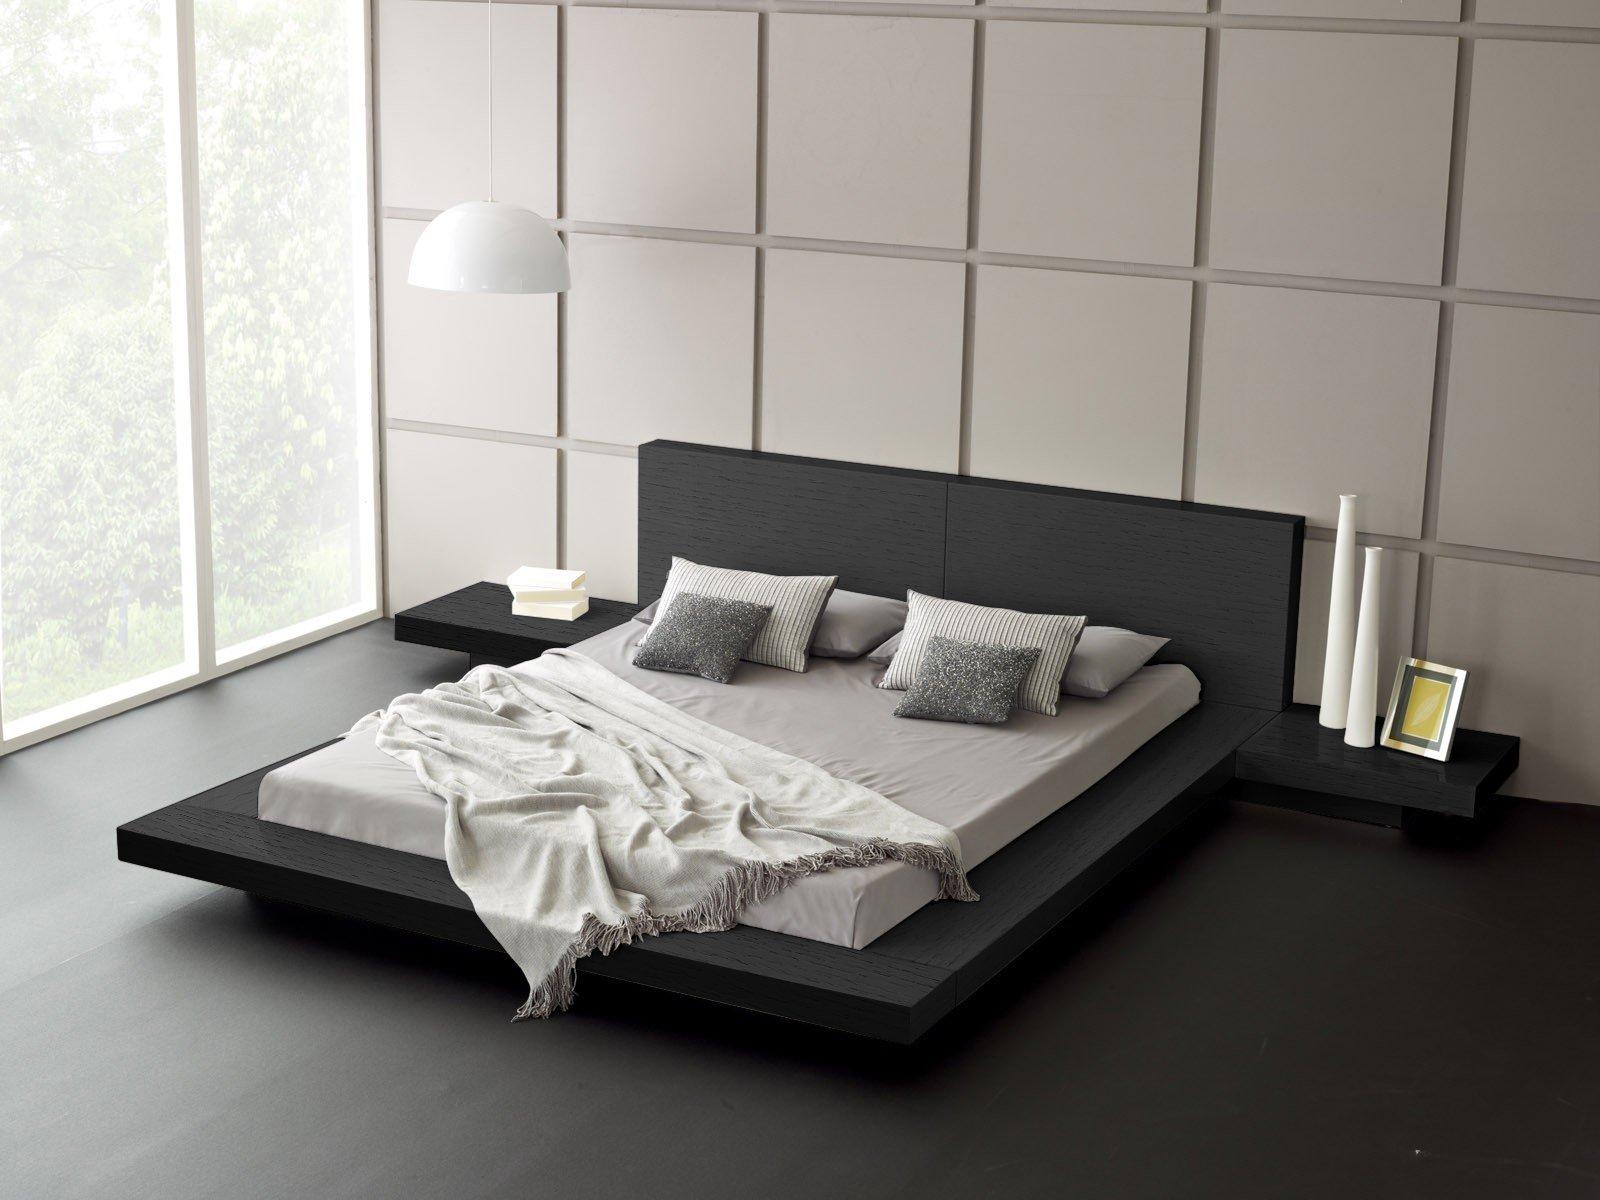 Matisse Fujian Modern Platform Bed + 2 Night Stands Queen (Ash Black) by Matisse